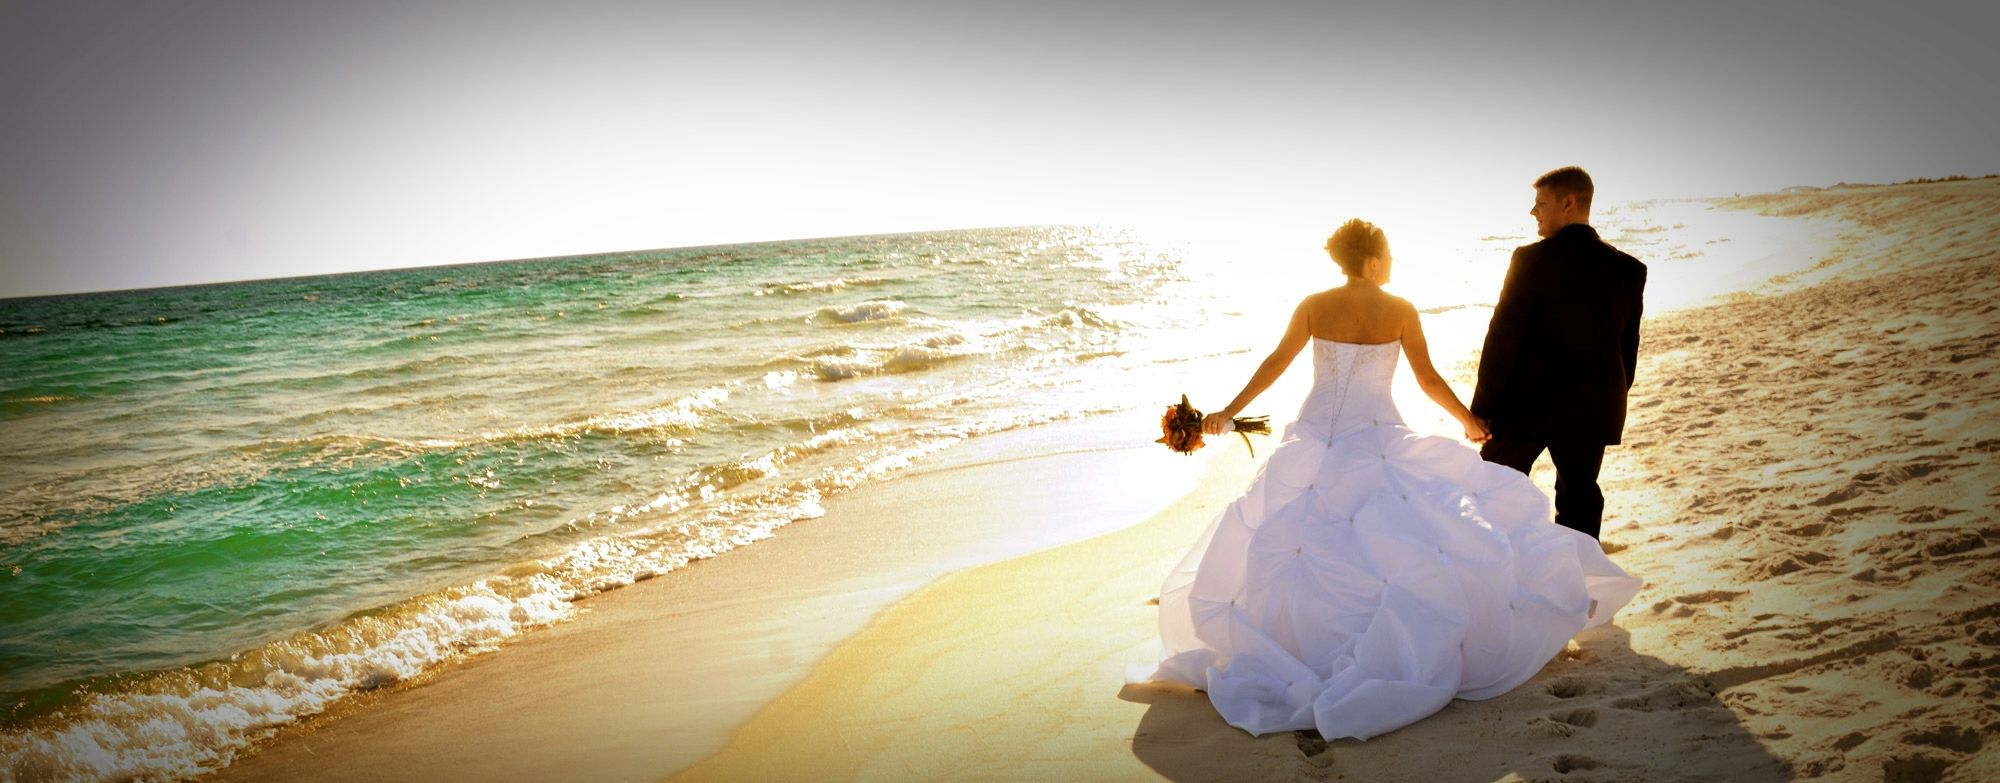 casamento-na-praia-da-reserva